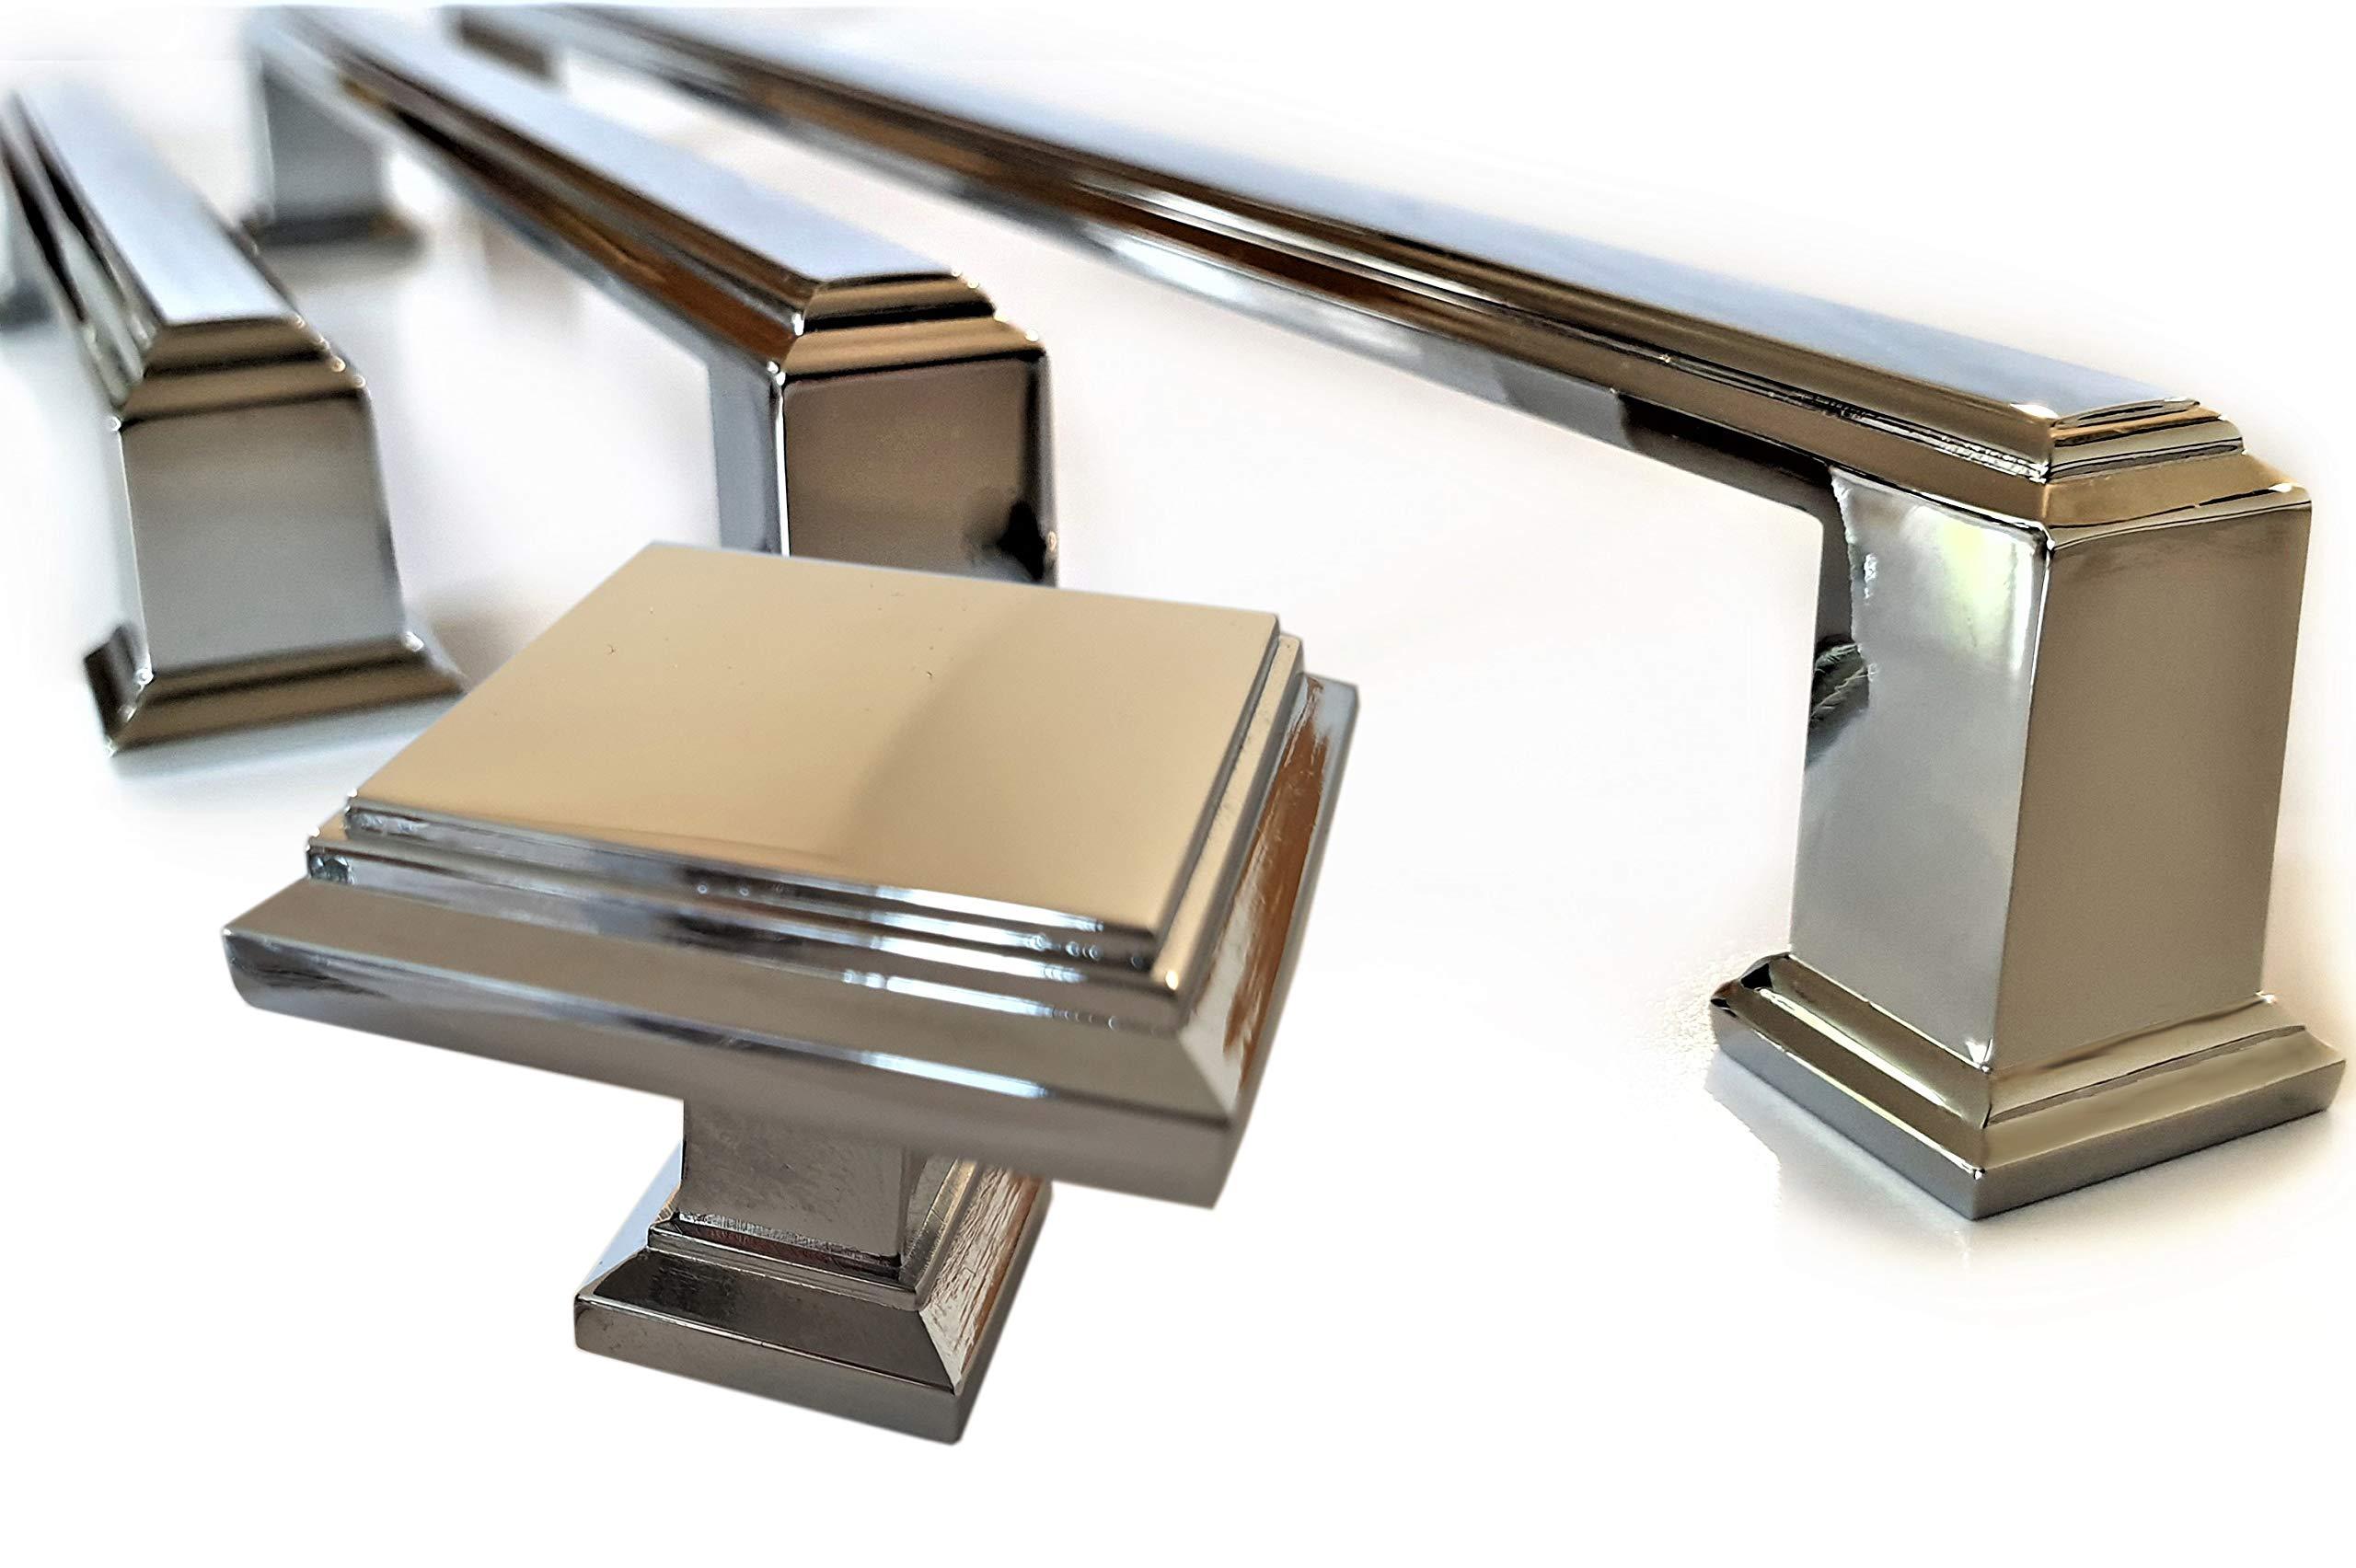 Set Of 6 Art Deco Style Handles Polished Chrome Cupboard Drawer Bedroom Furniture Cc Size 192mm Buy Online In Andorra At Andorra Desertcart Com Productid 149906064